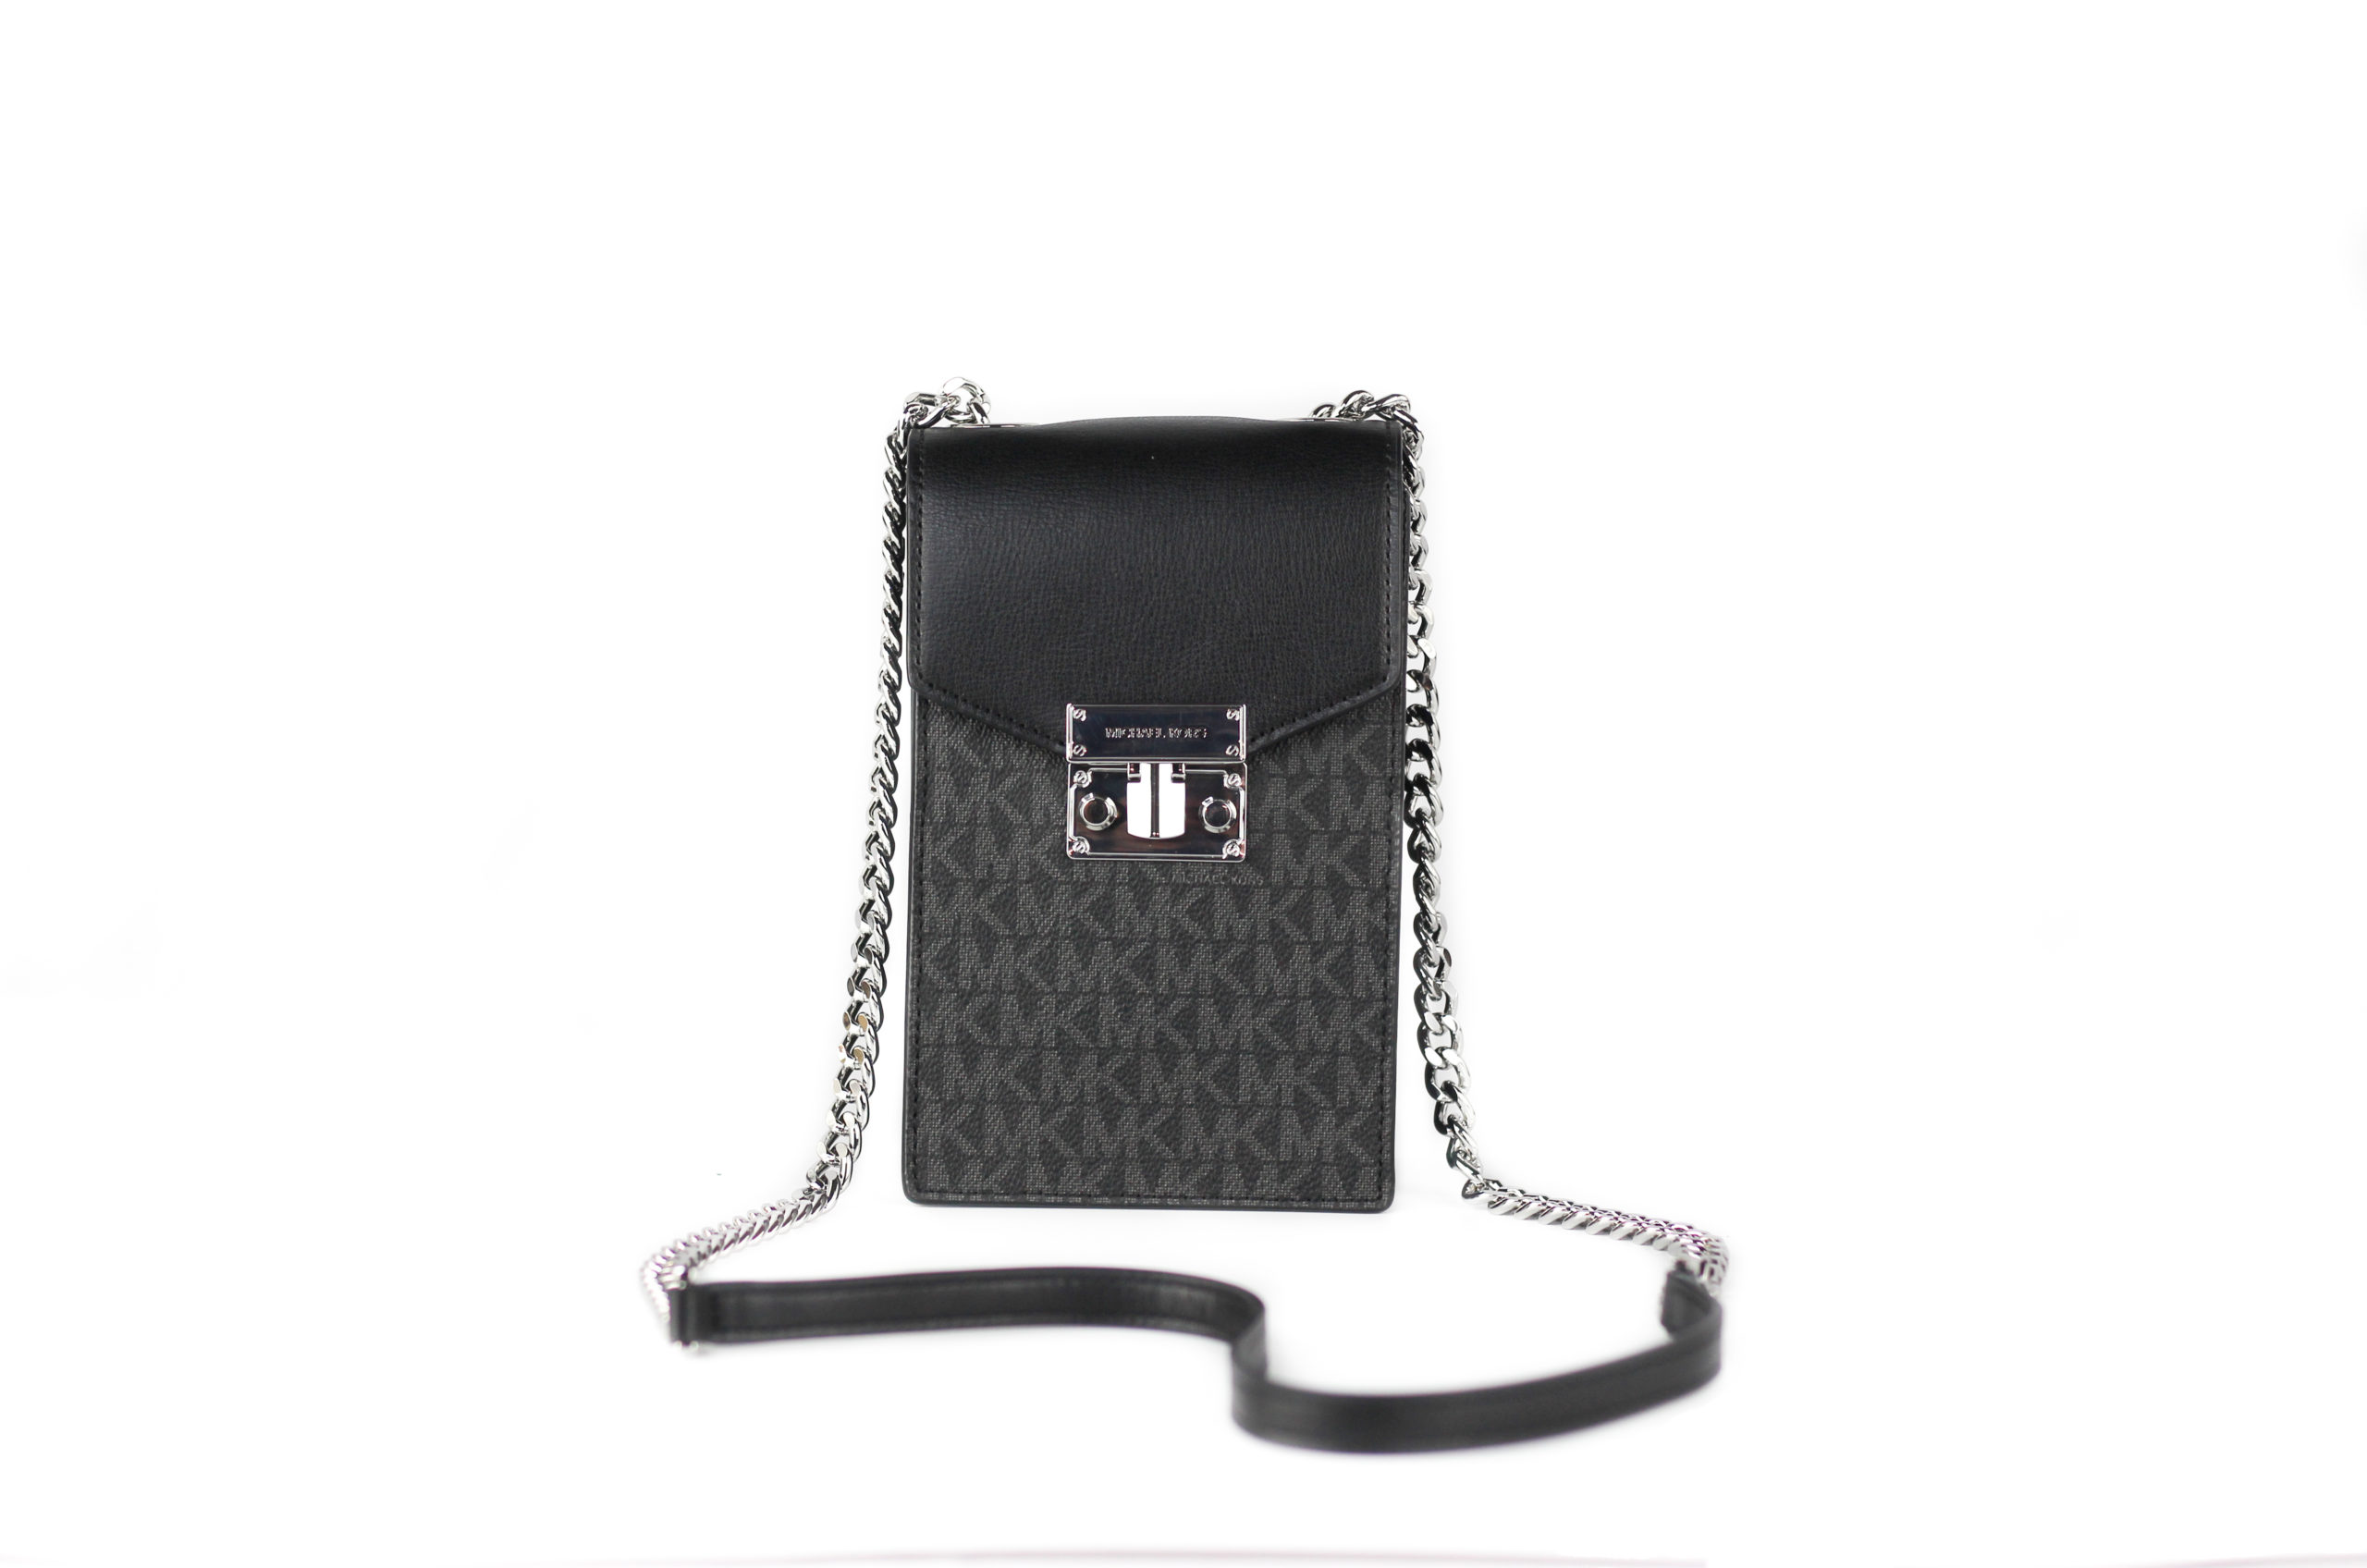 Rose Small Signature PVC Leather NS Phone Crossbody Handbag Purse [Black]